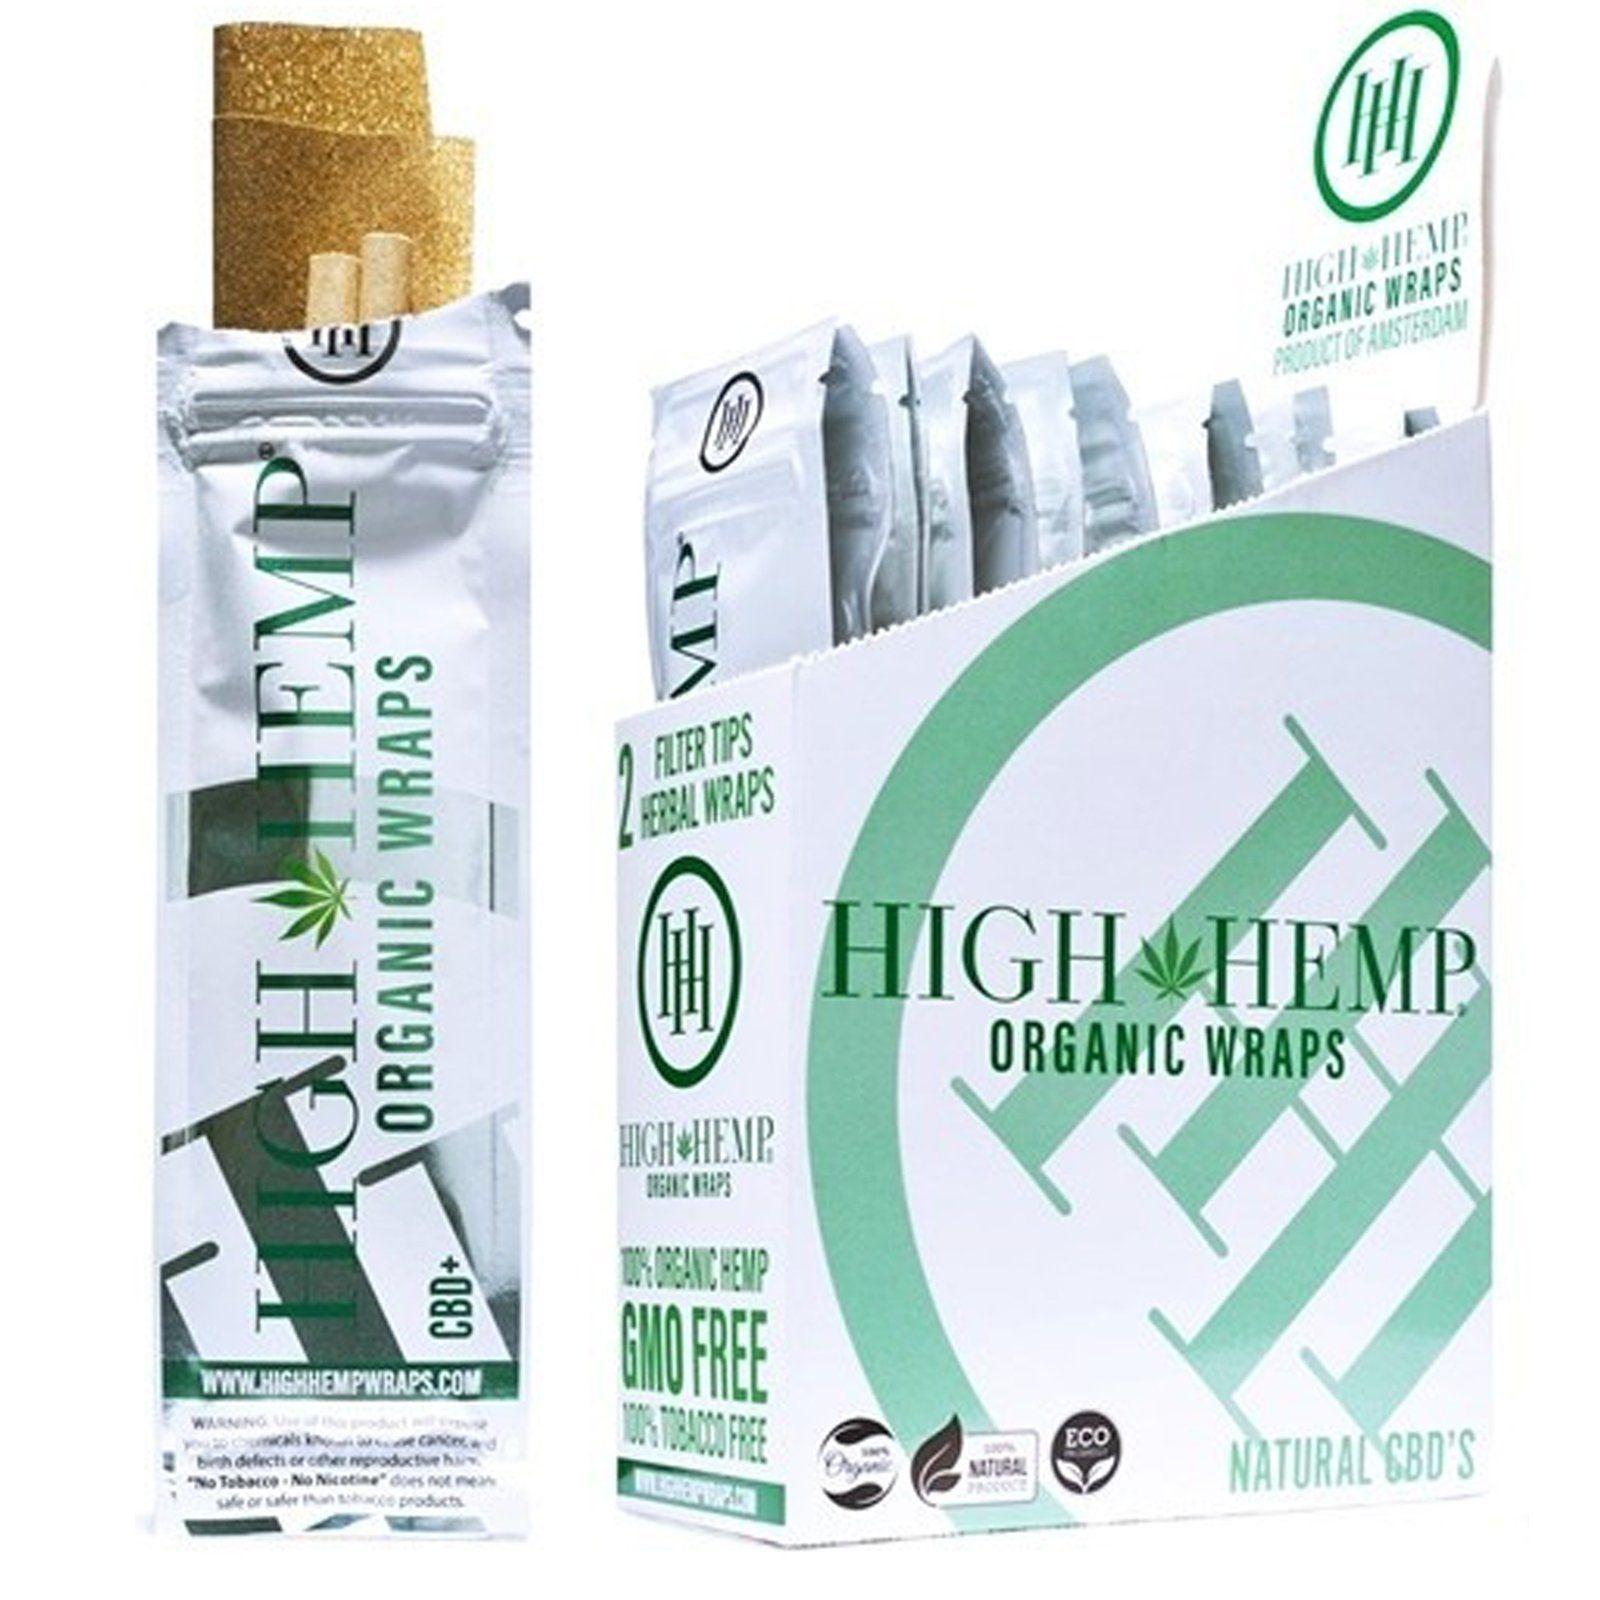 High Hemp Organic Wraps Original Full Box 25 Wraps Hemp